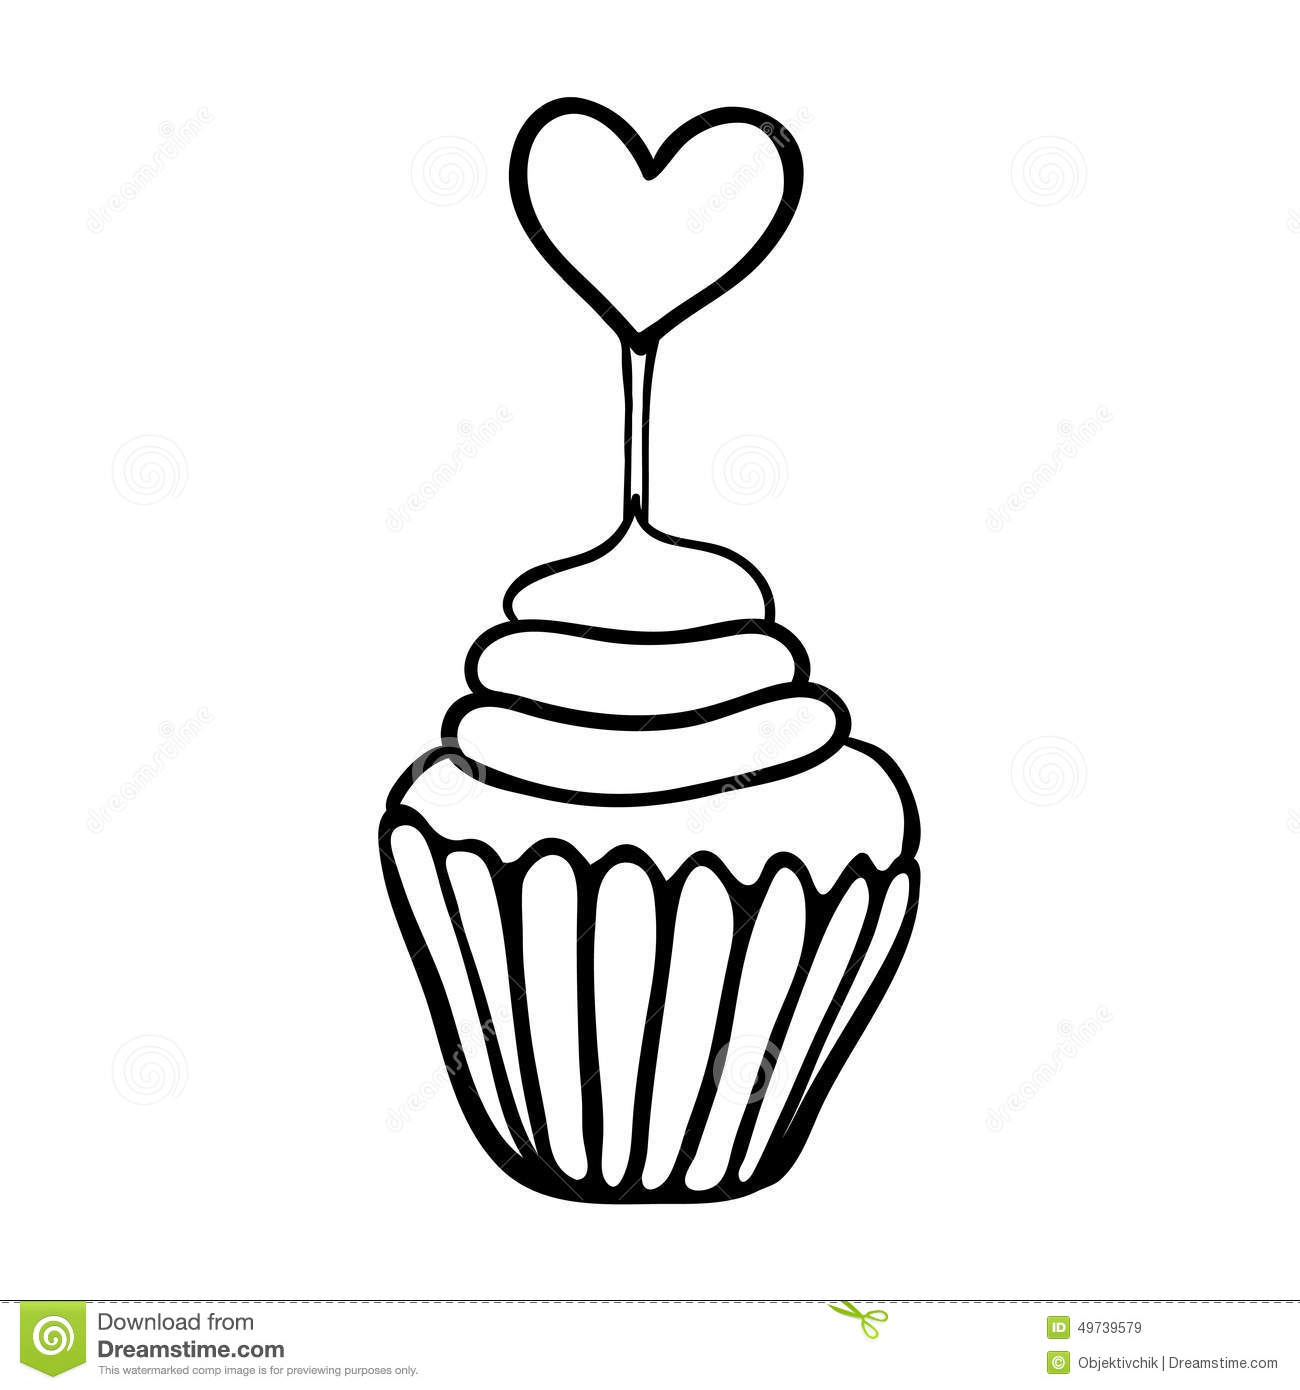 Cupcake Black And White Drawing